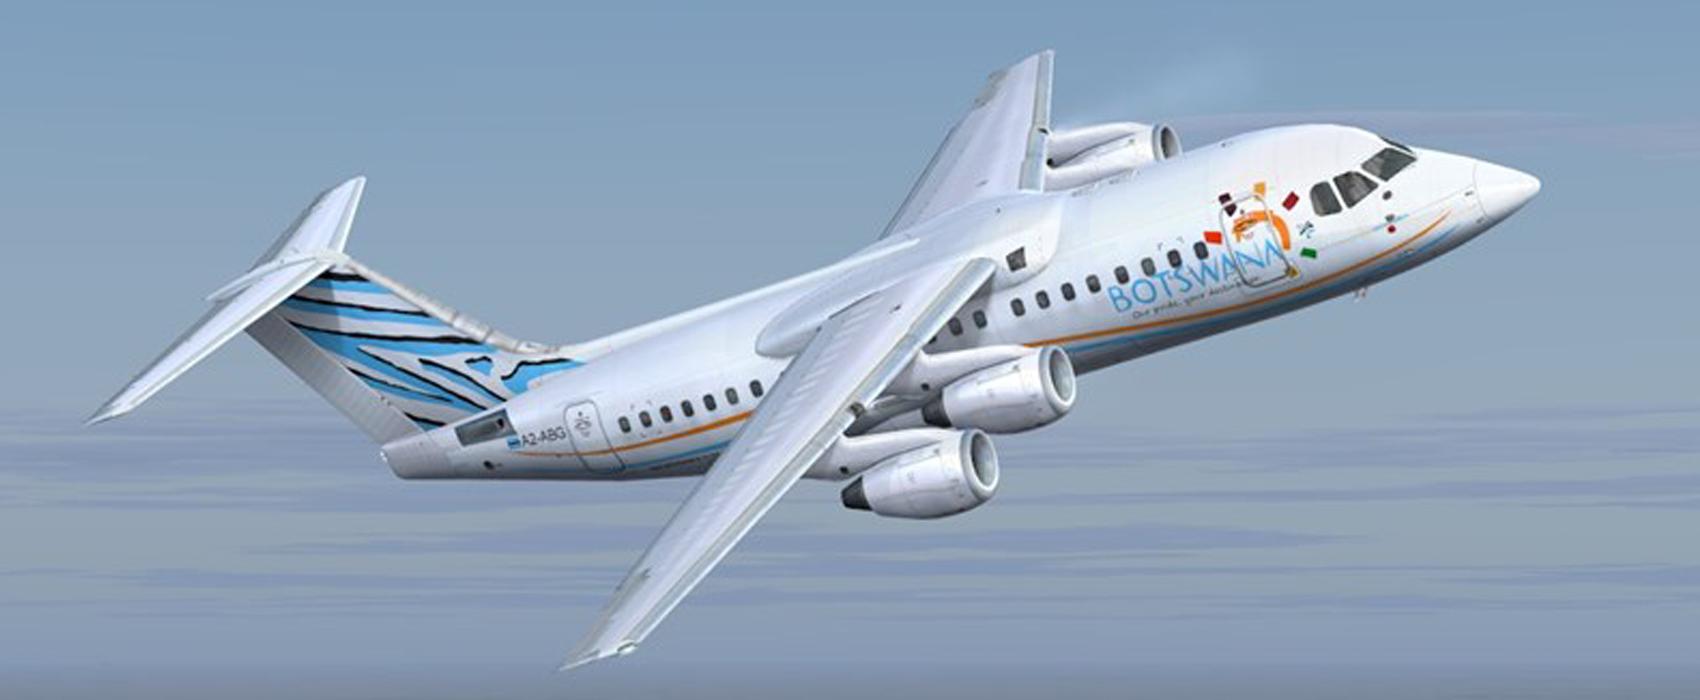 Air_Botswana_Direct_Flights